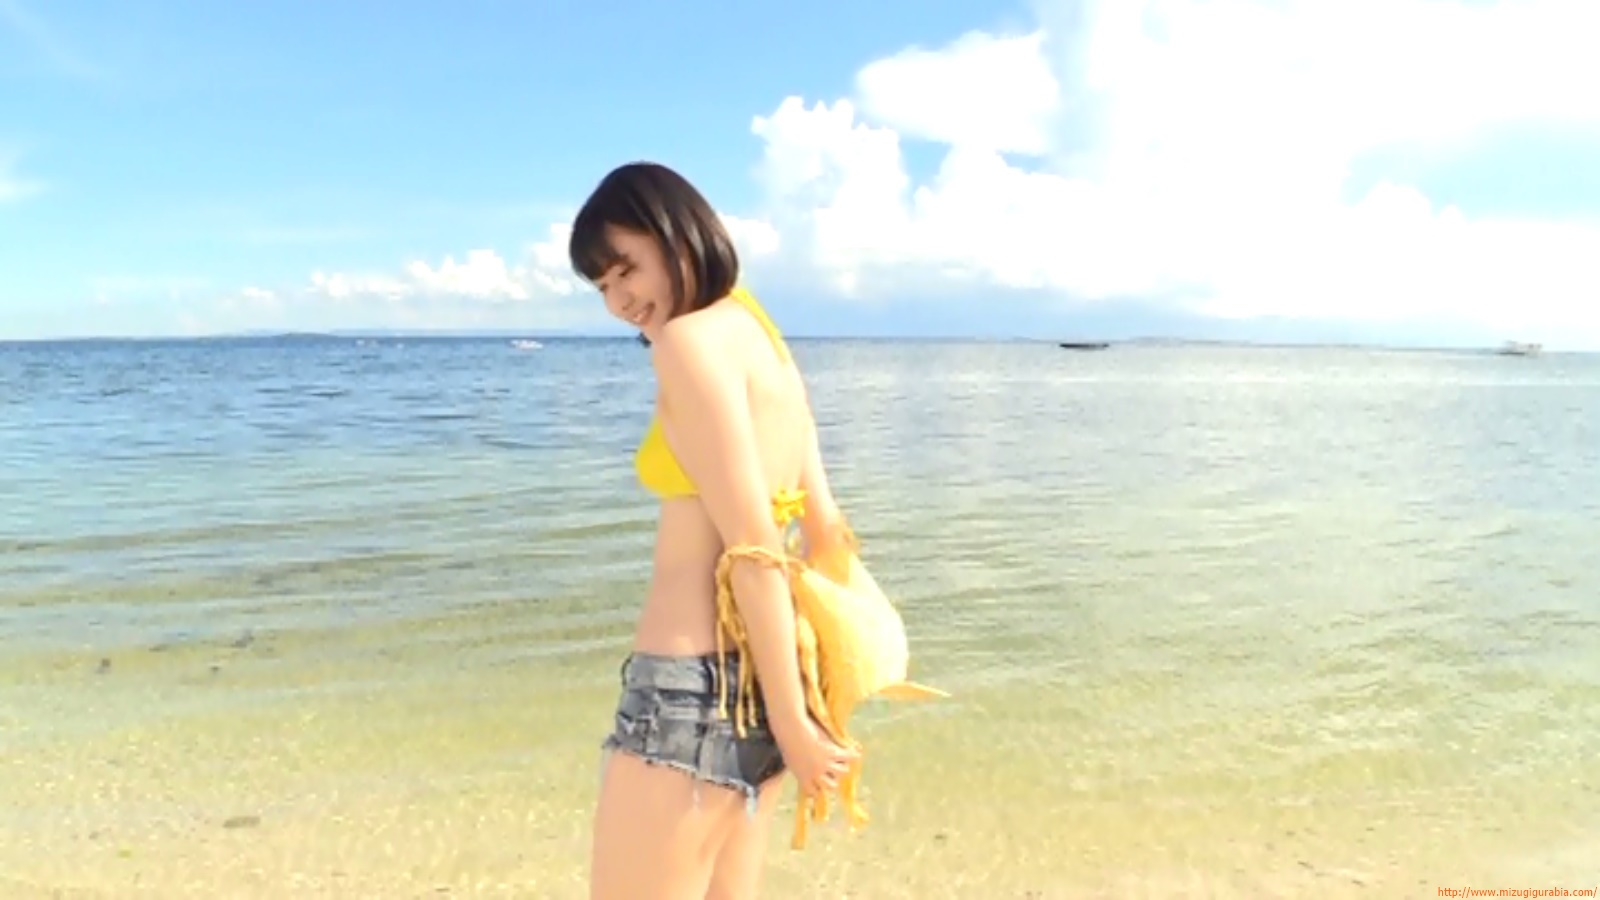 Beach dating114